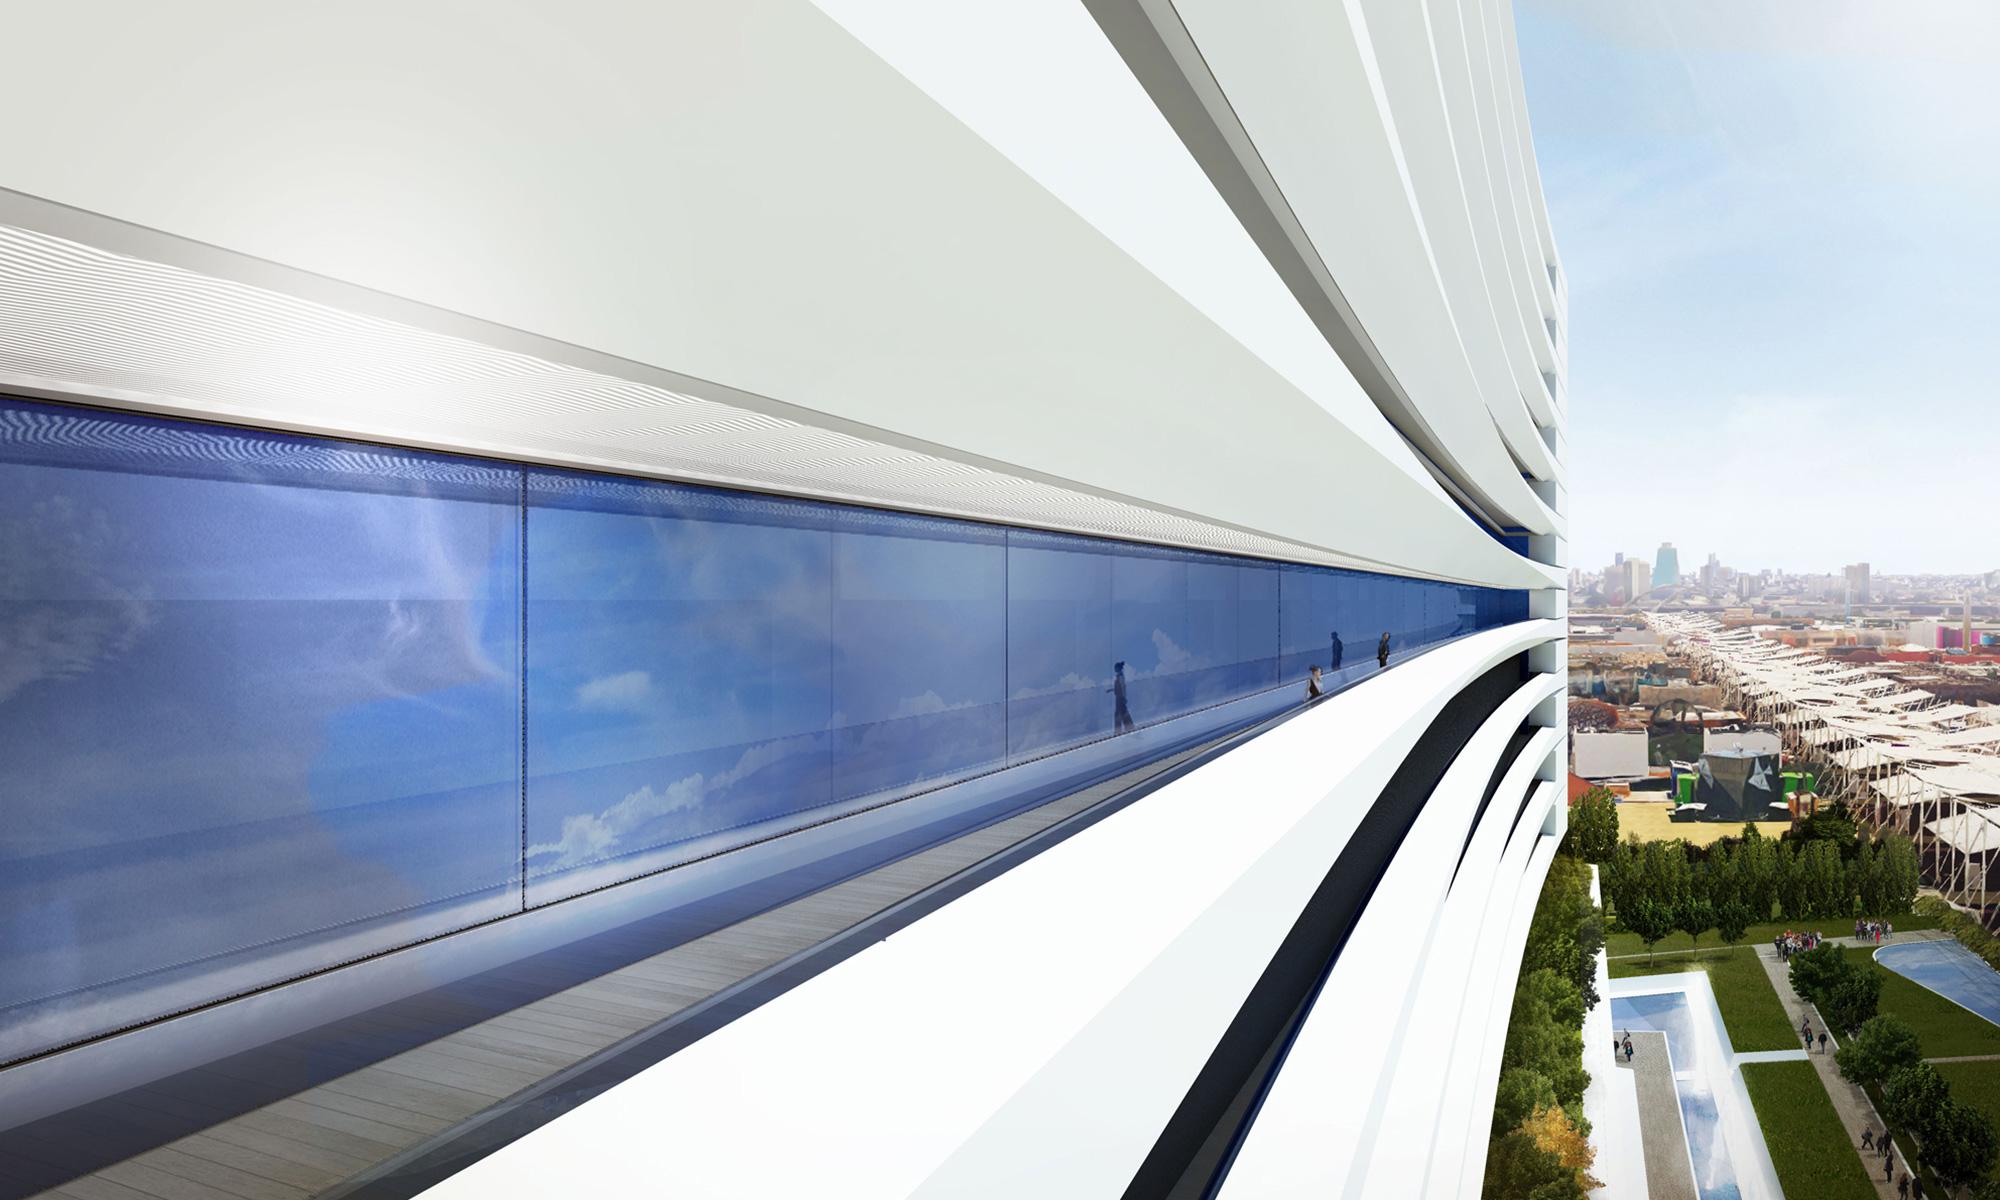 Ingegnere Maria Vittoria Tagliaferri, IRCCS Galeazzi, Milano, Binini Partners, Società di architettura e ingegneria